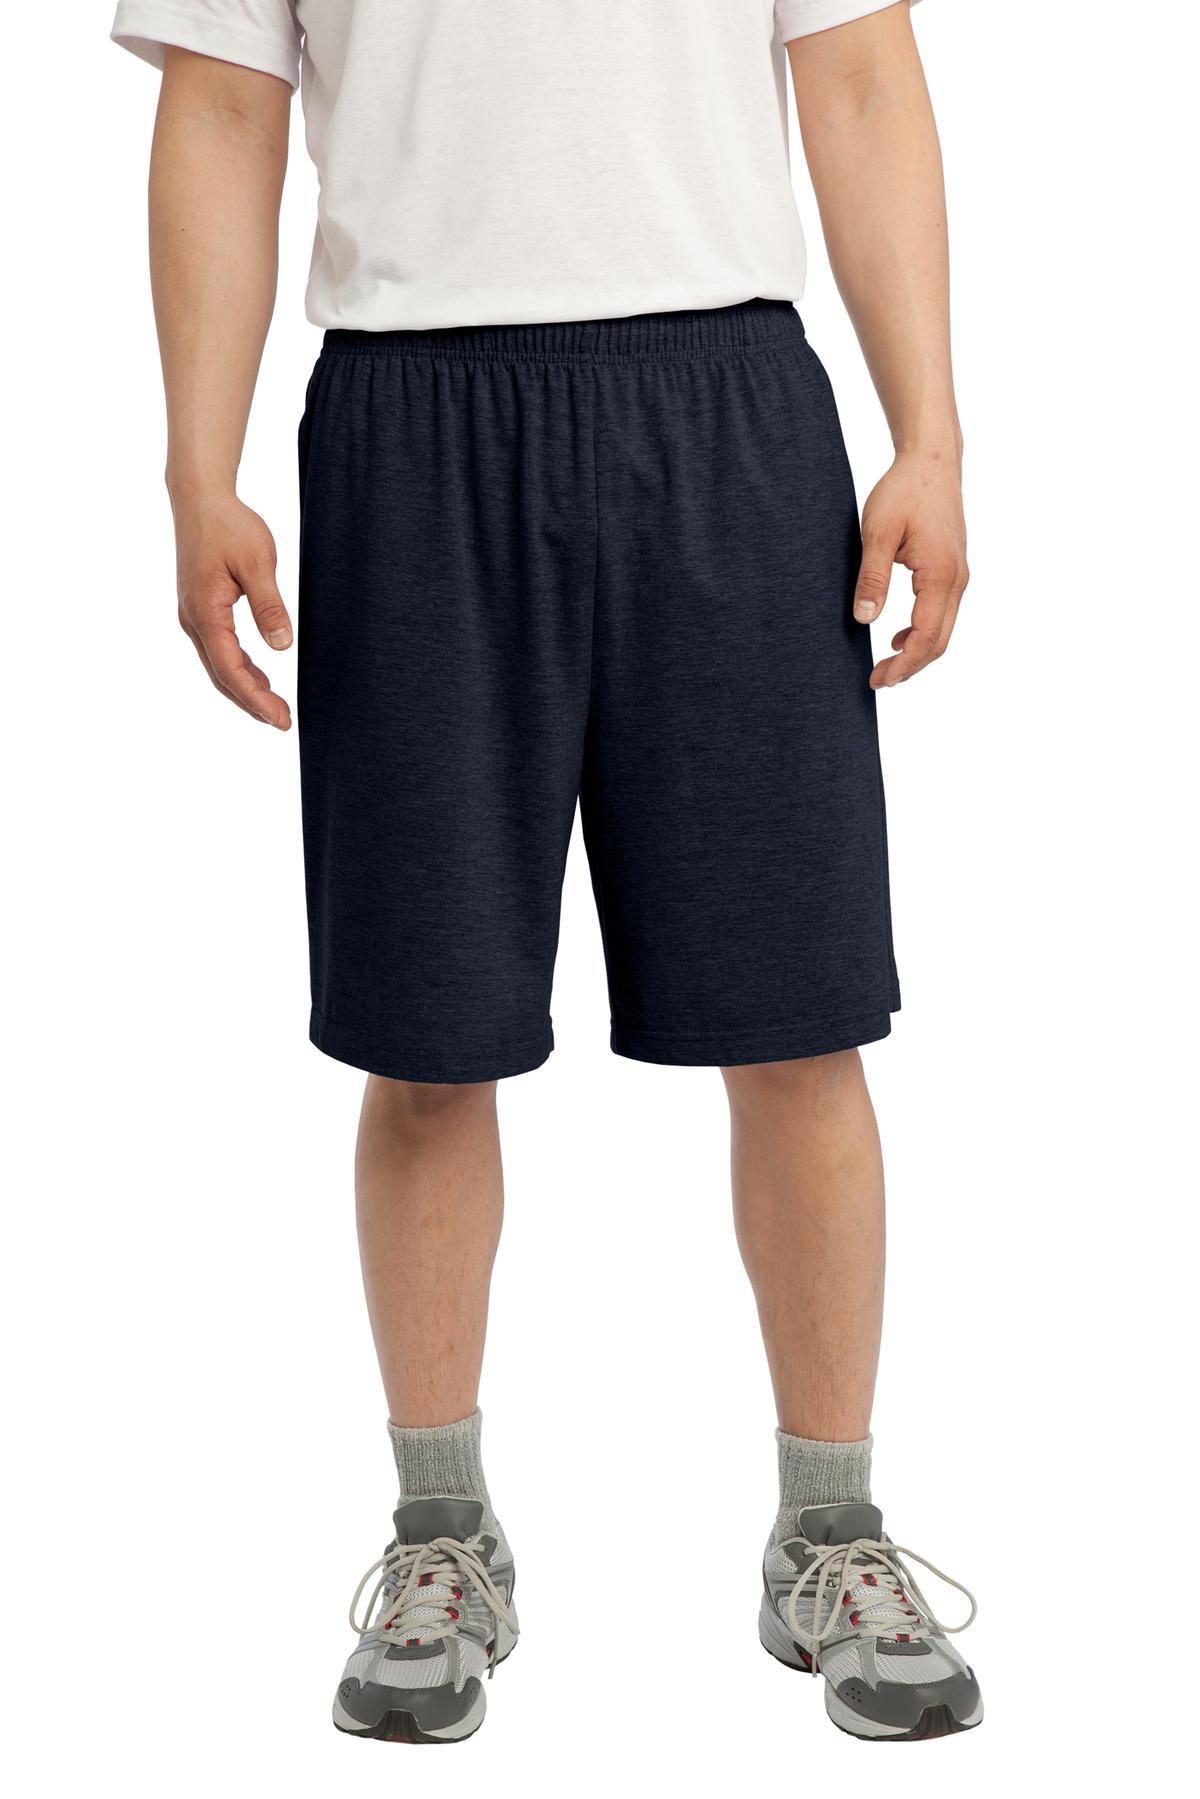 Sport-Tek® Jersey Knit Short with Pockets.-Sport-Tek